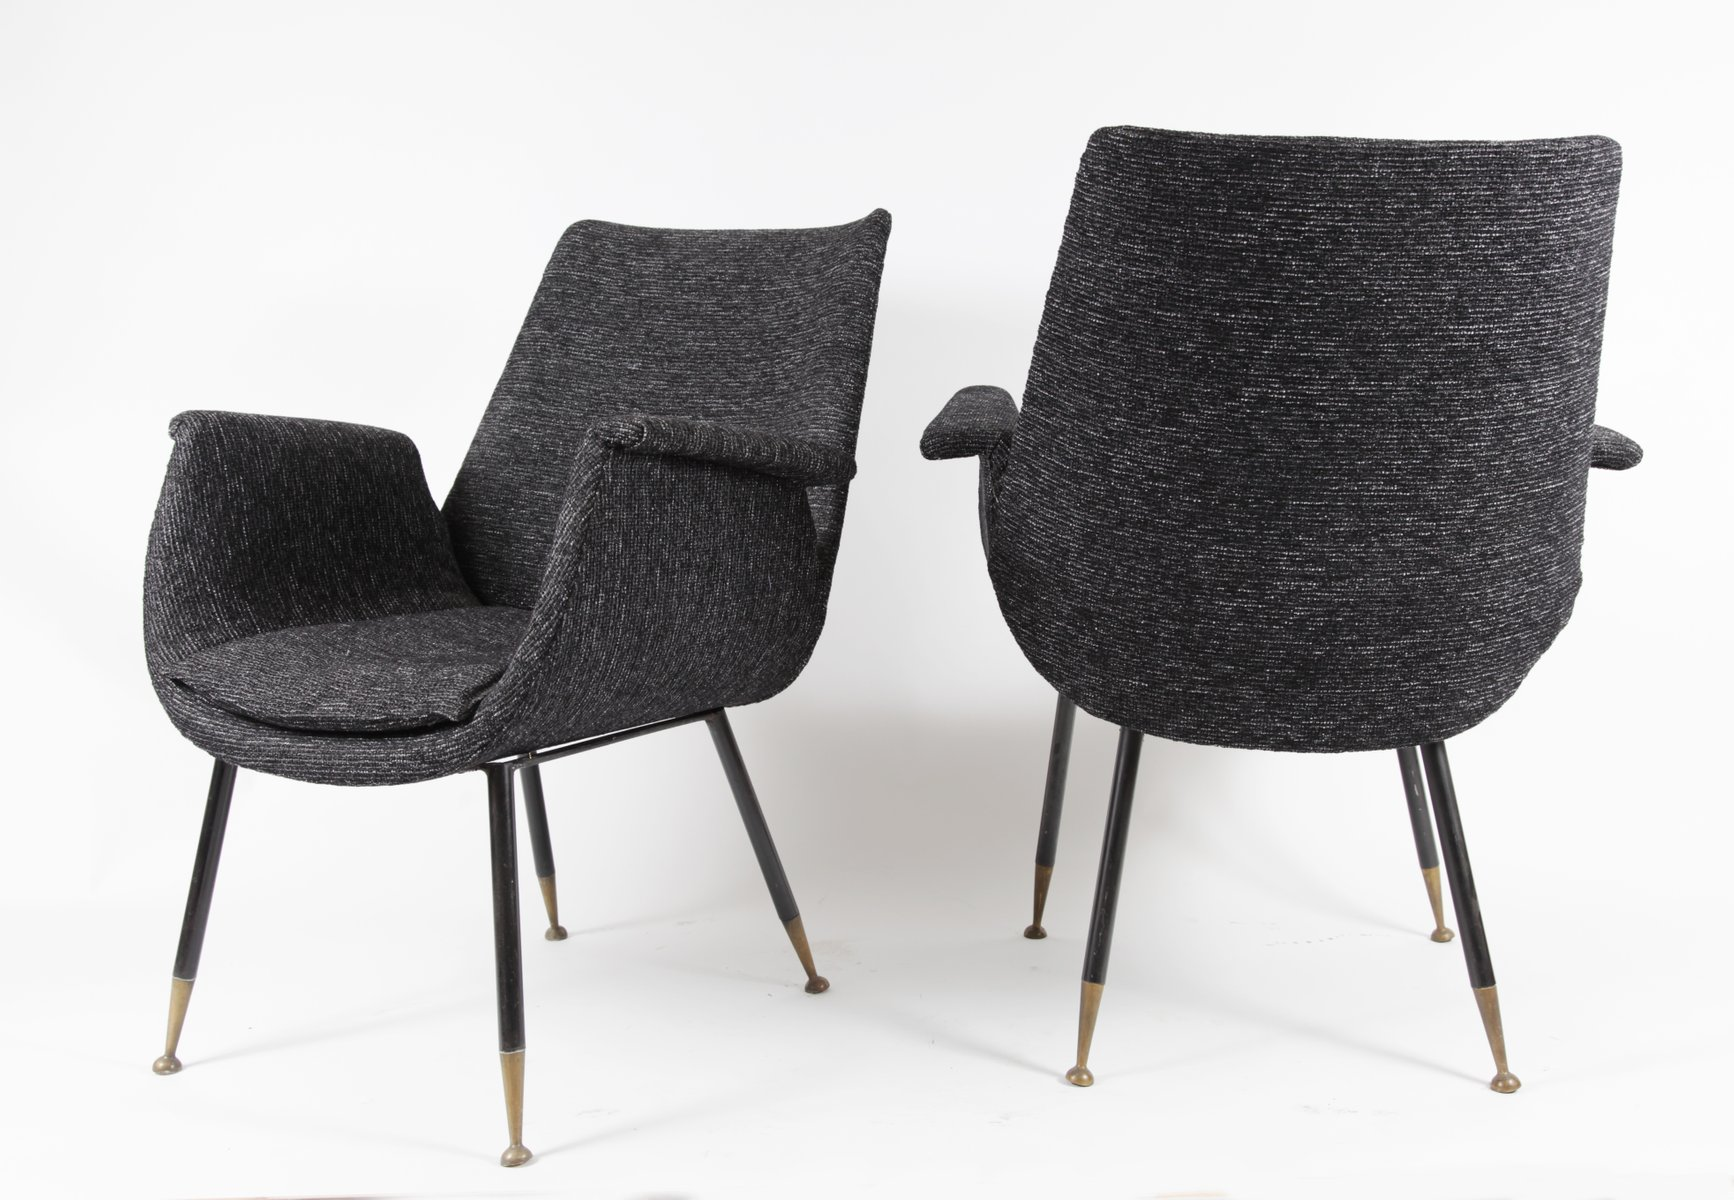 kleine sessel von gastone rinaldi f r rima 1956 2er set. Black Bedroom Furniture Sets. Home Design Ideas